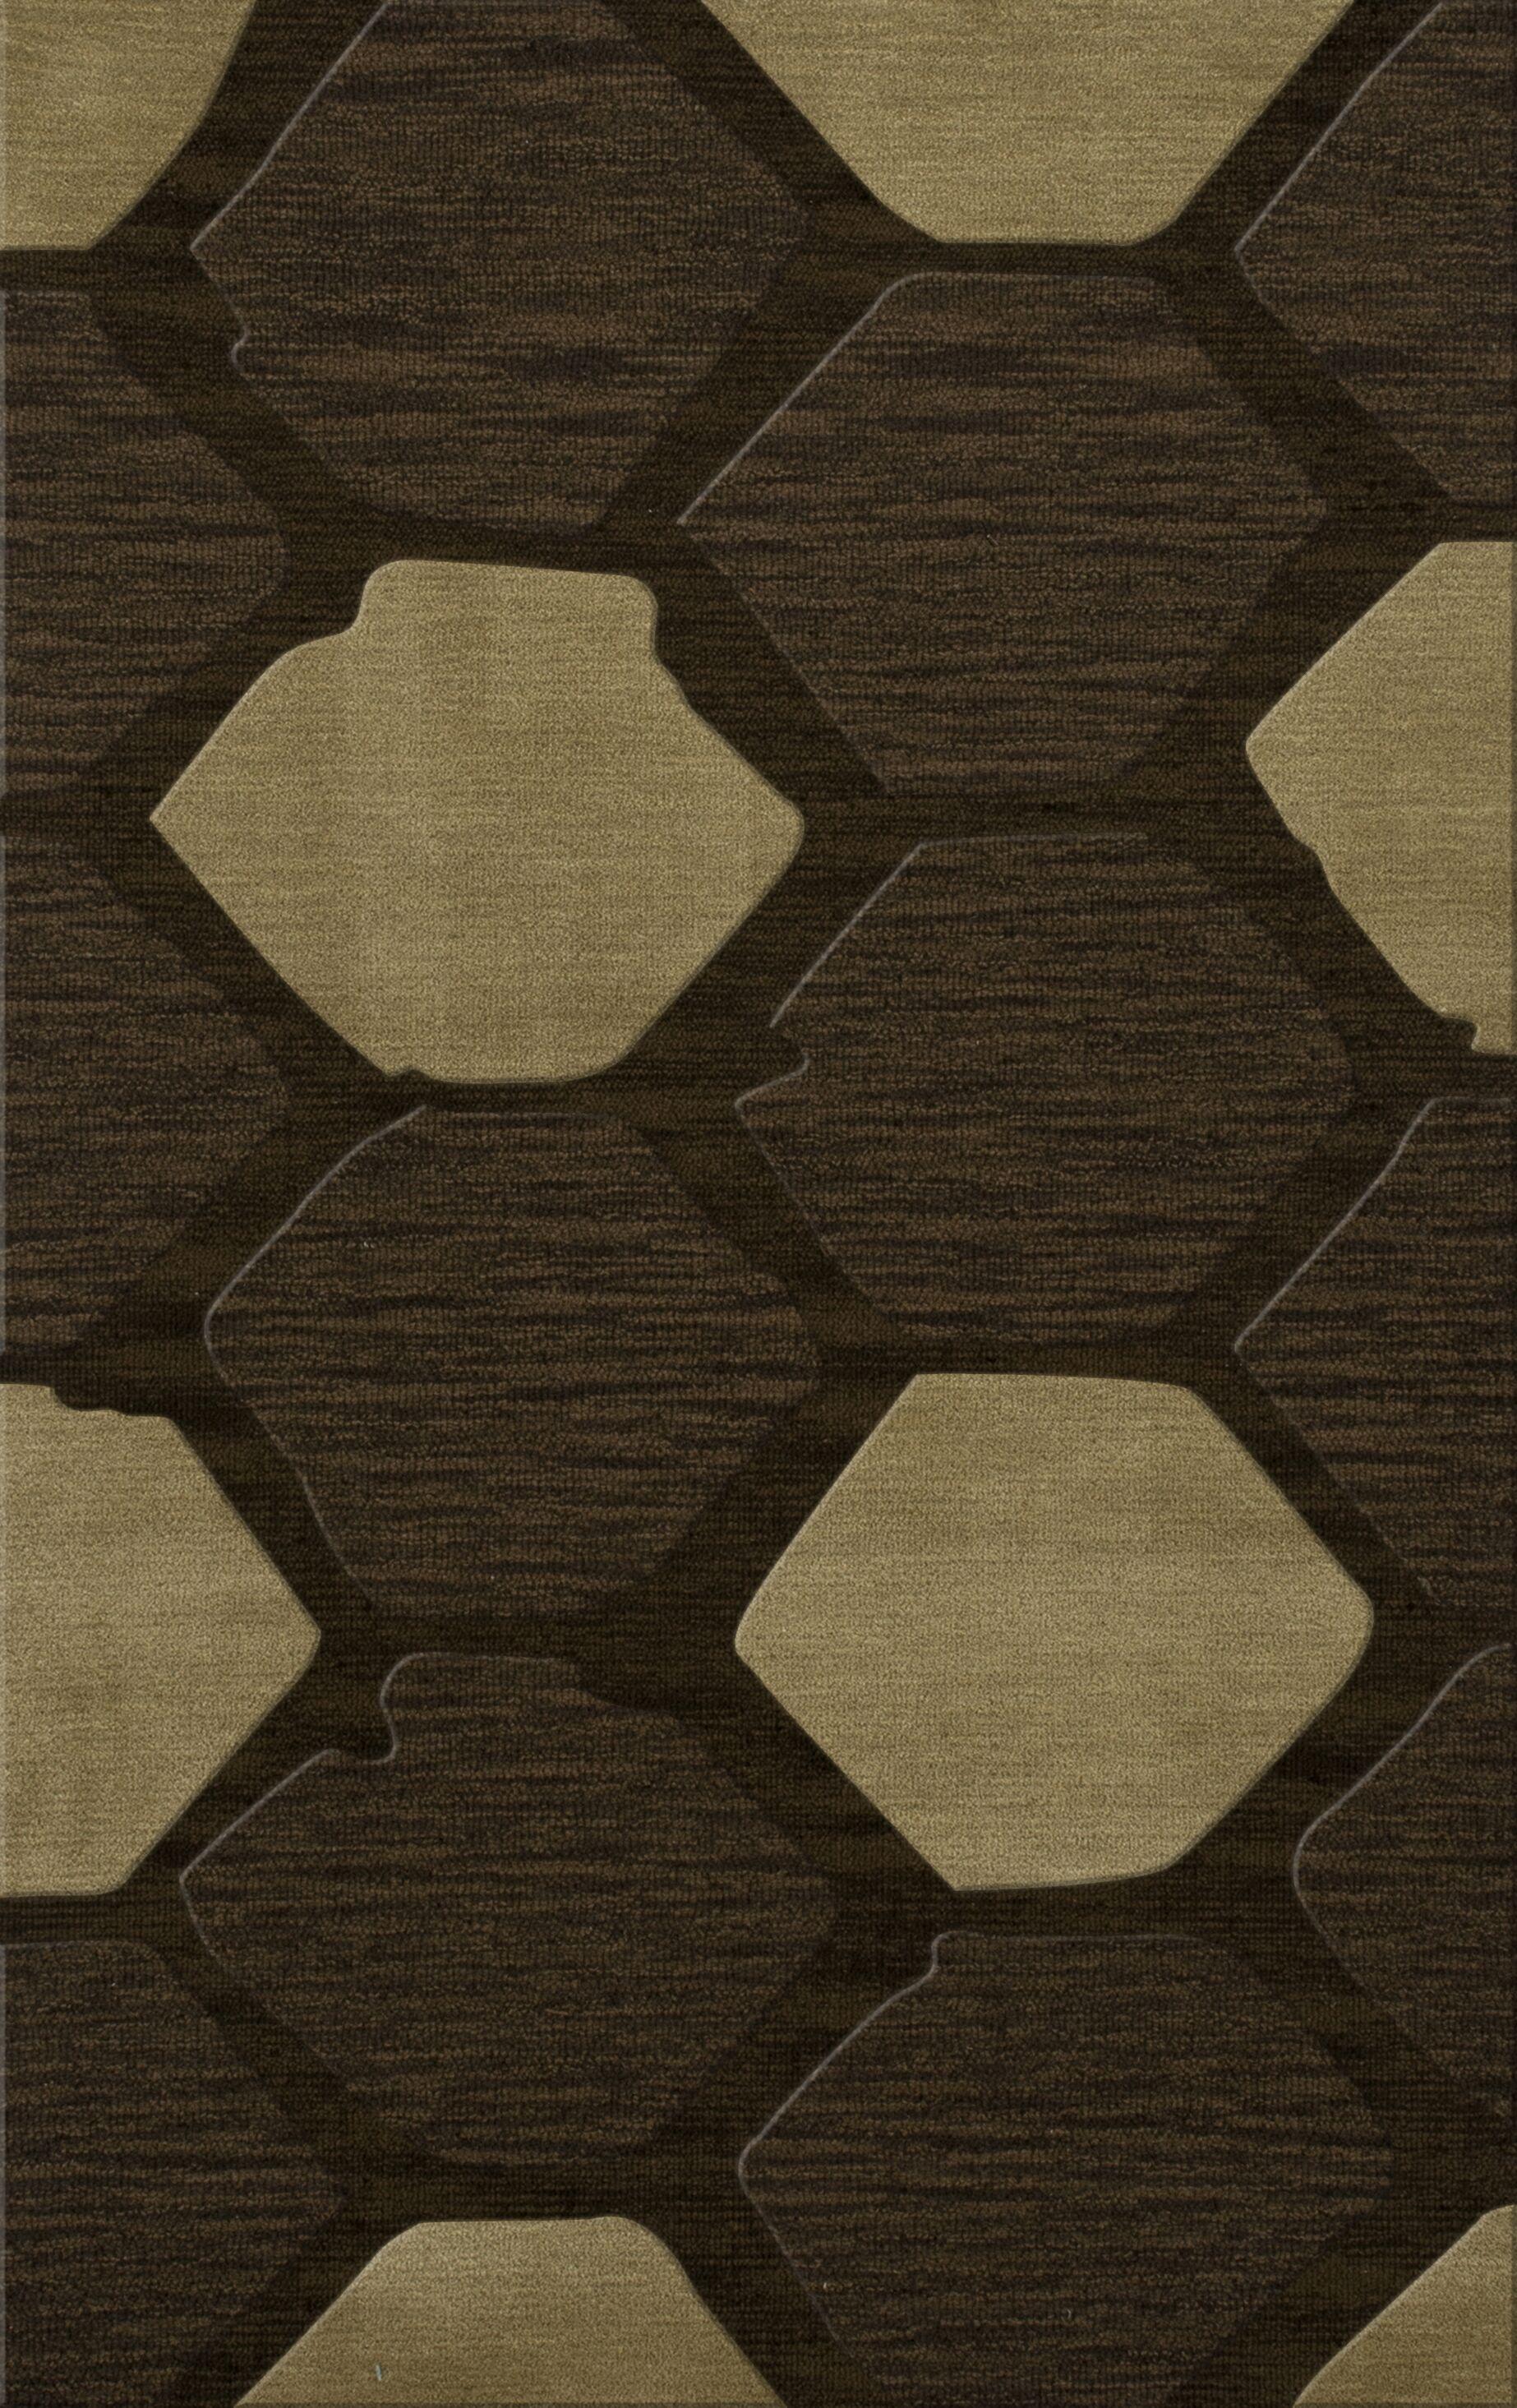 Hanover Wool Fennel Area Rug Rug Size: Rectangle 9' x 12'